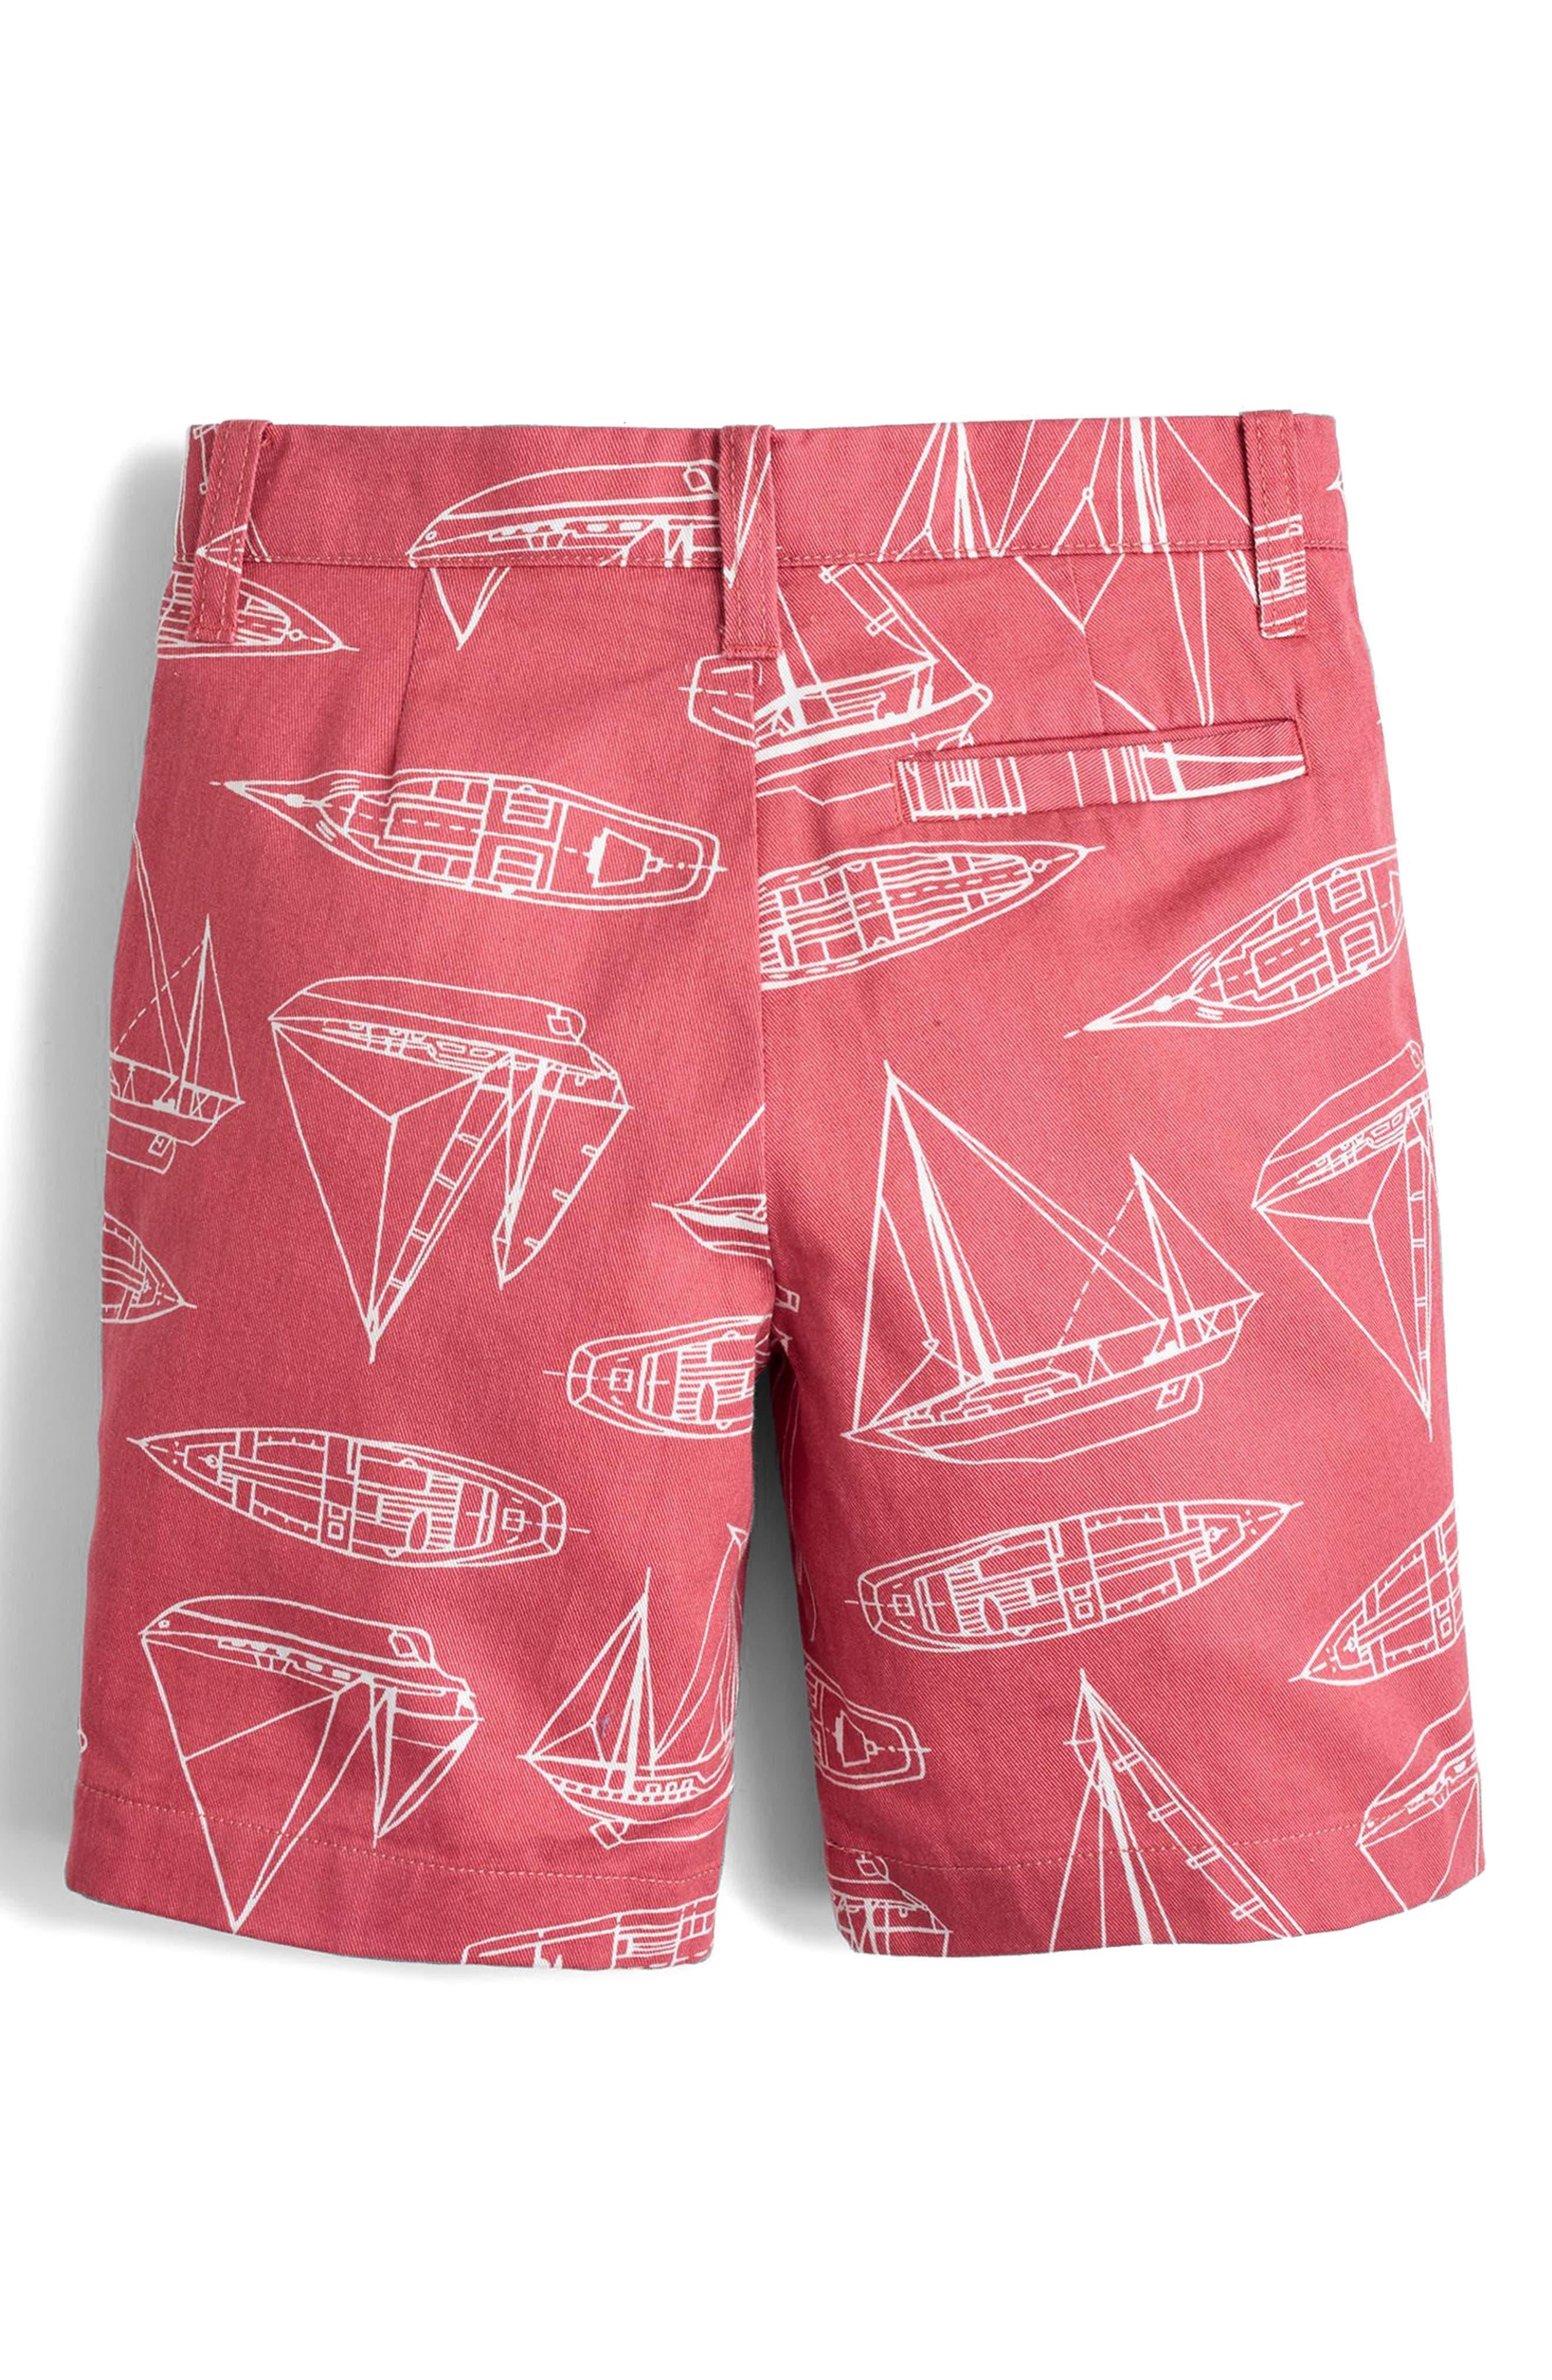 Stanton Boat Print Shorts,                             Alternate thumbnail 2, color,                             600